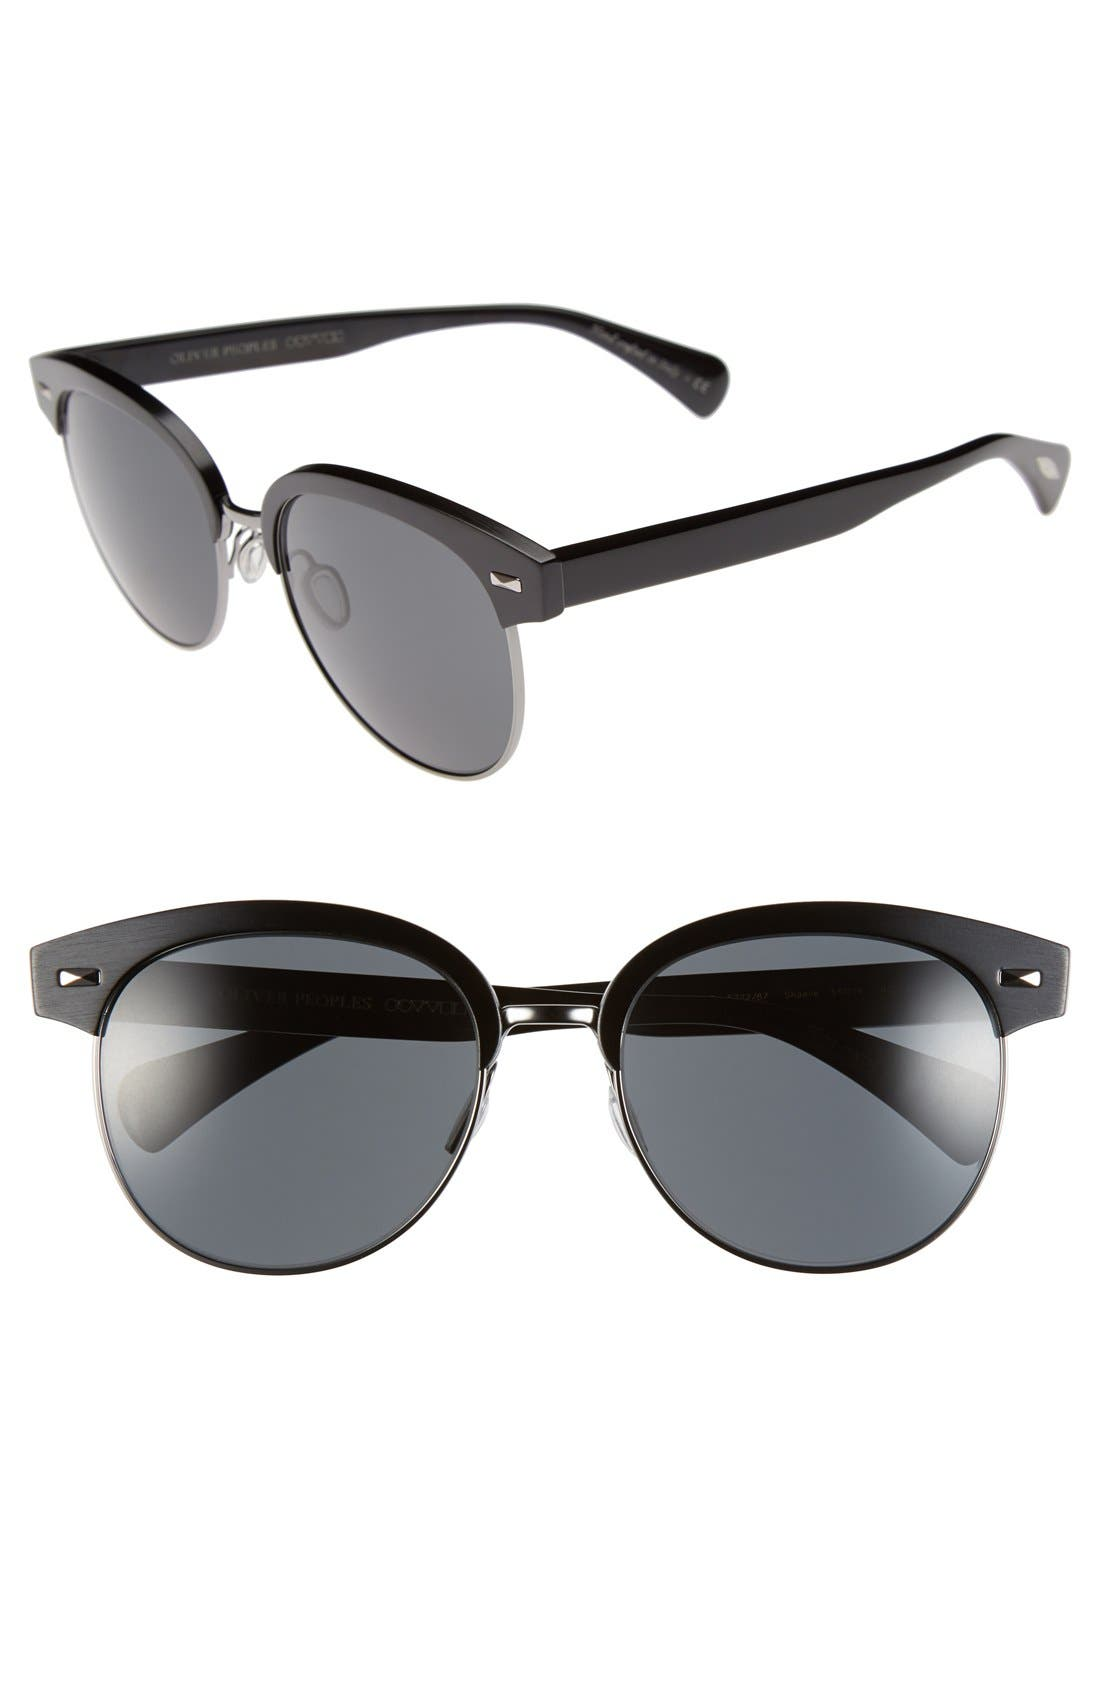 Main Image - Oliver Peoples 'Shaelie' 55mm Sunglasses